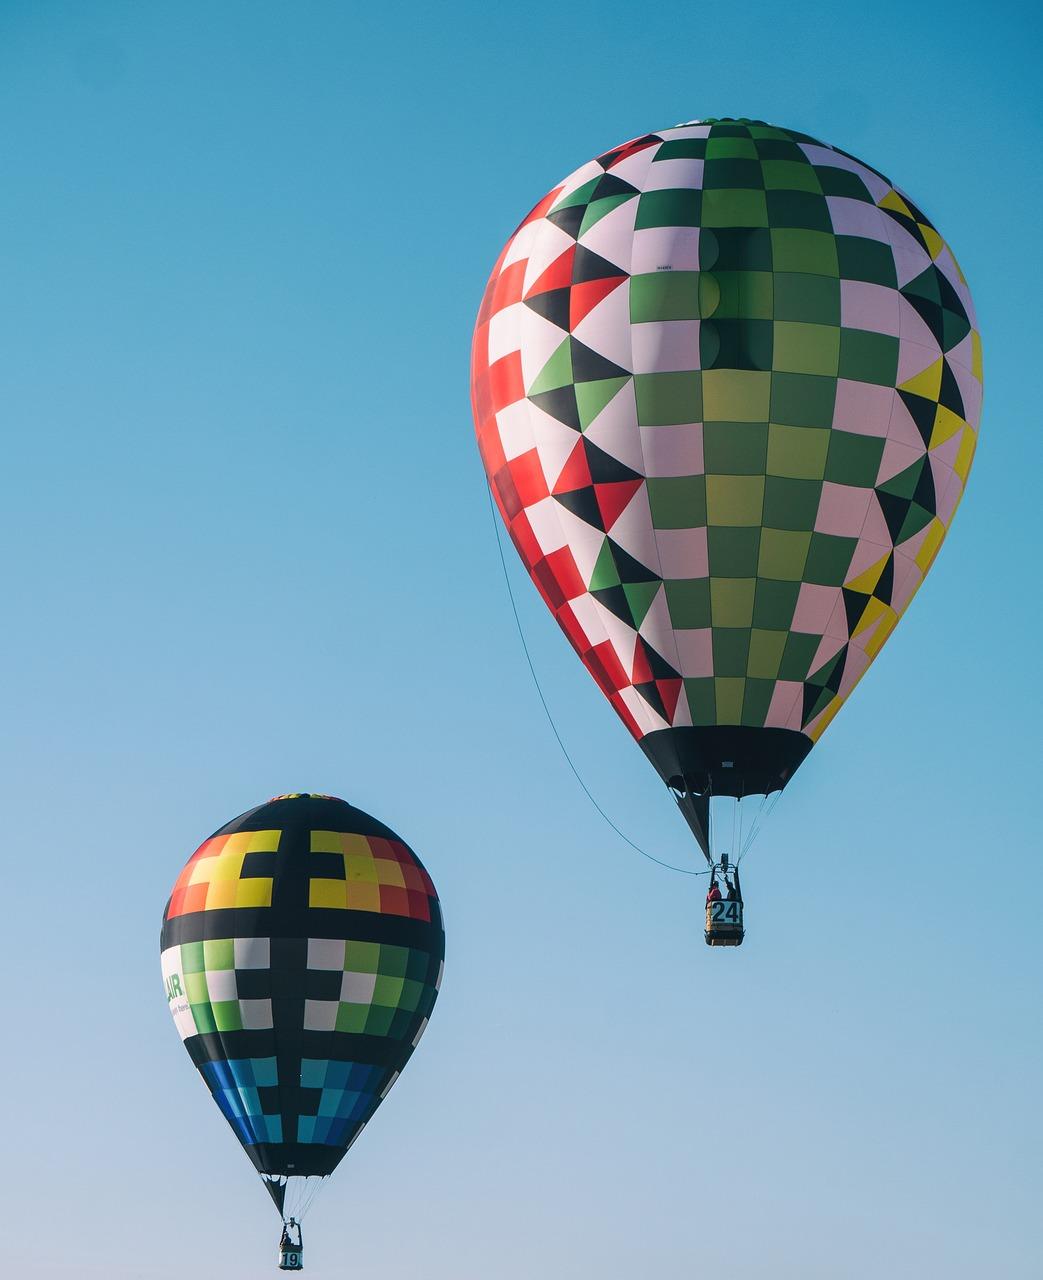 adventure balloons festival flight fun free photo from